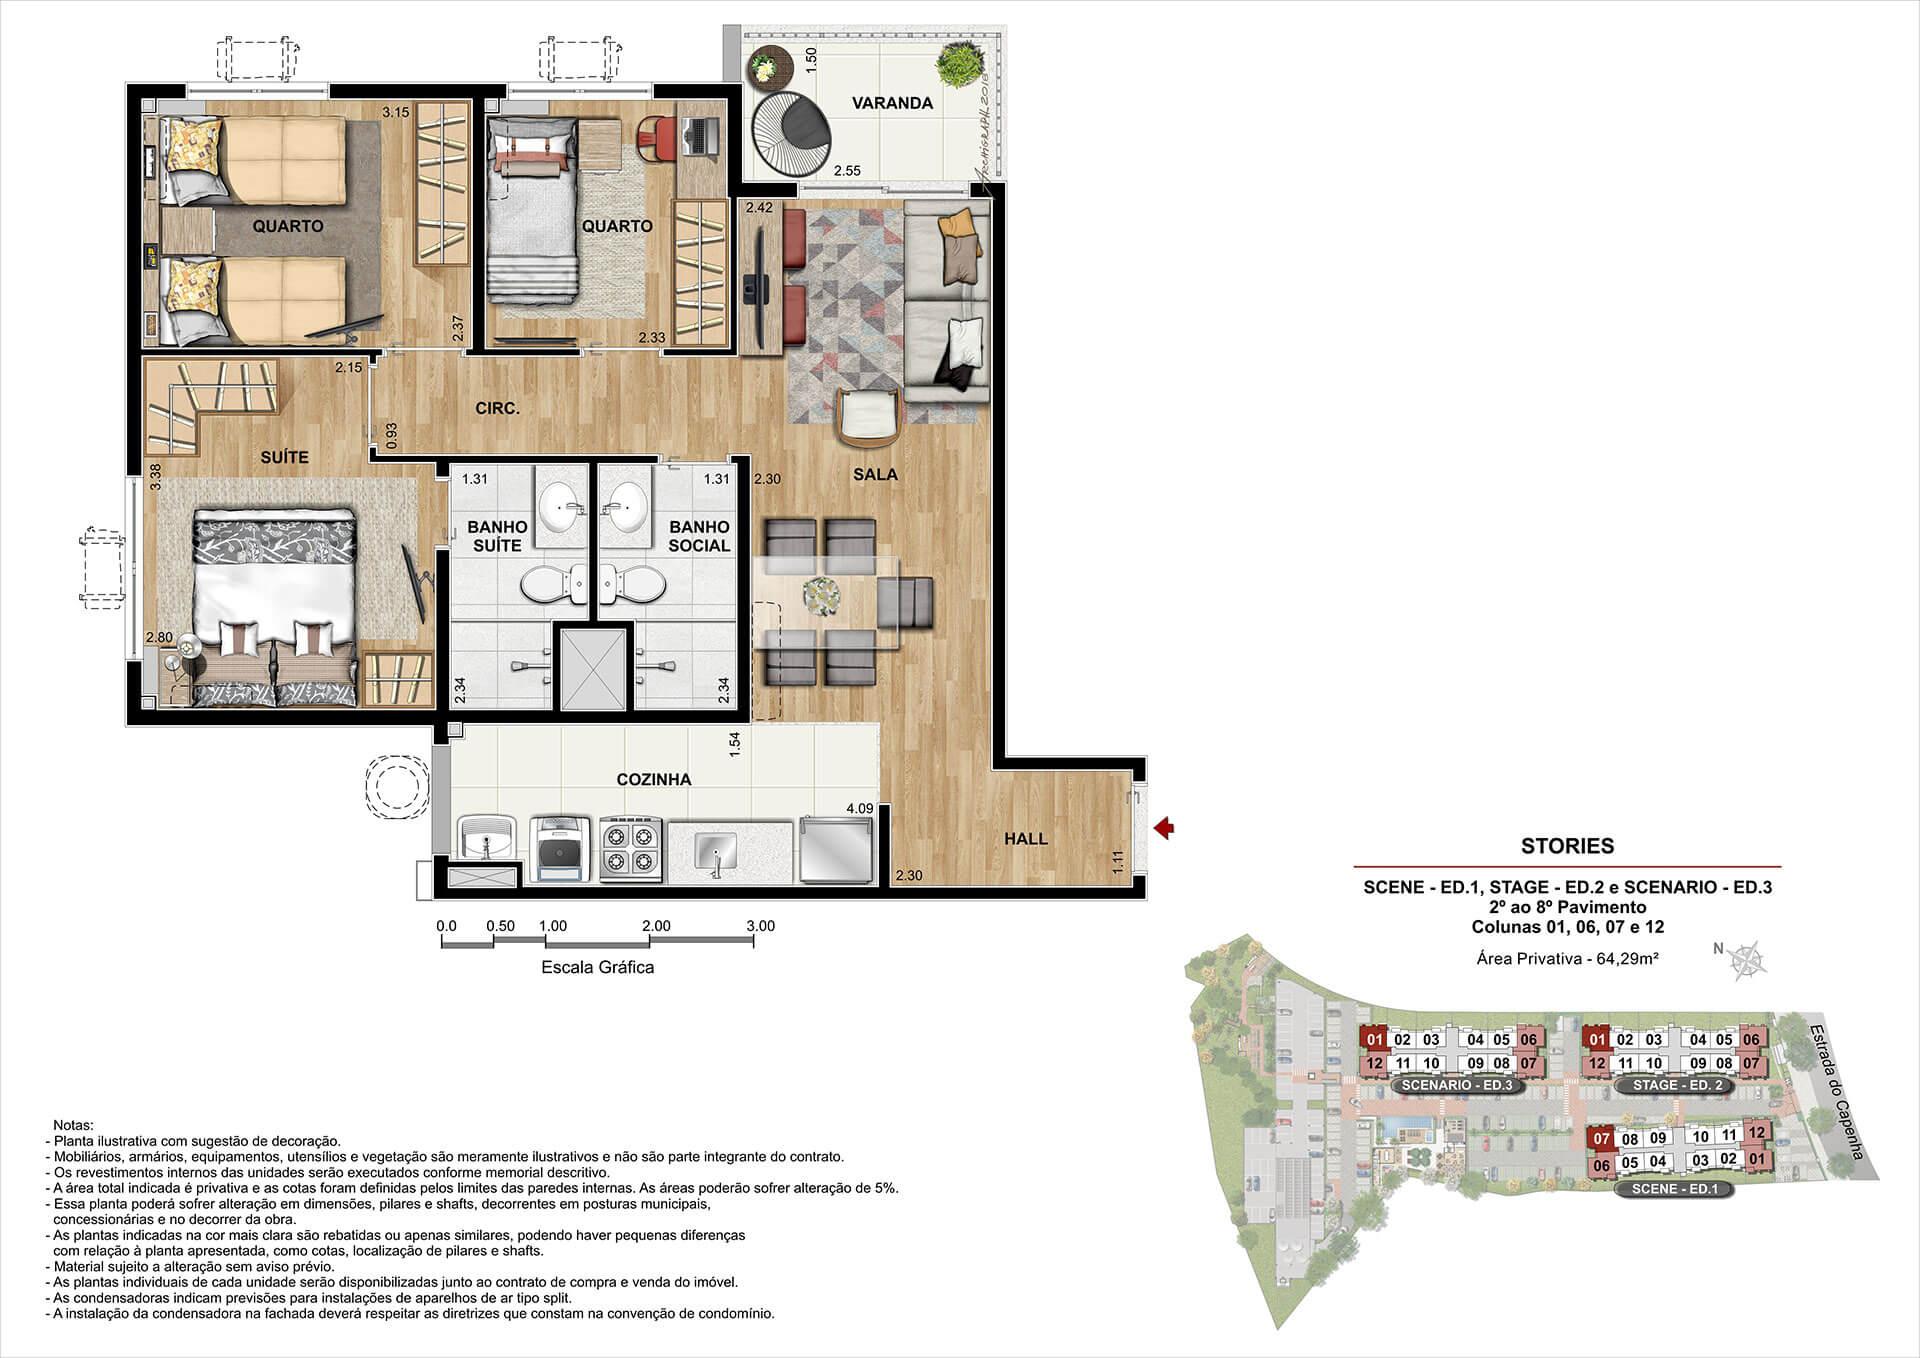 35cd0da6f9 Index of  lancamentosrj images stories-residence-pechincha